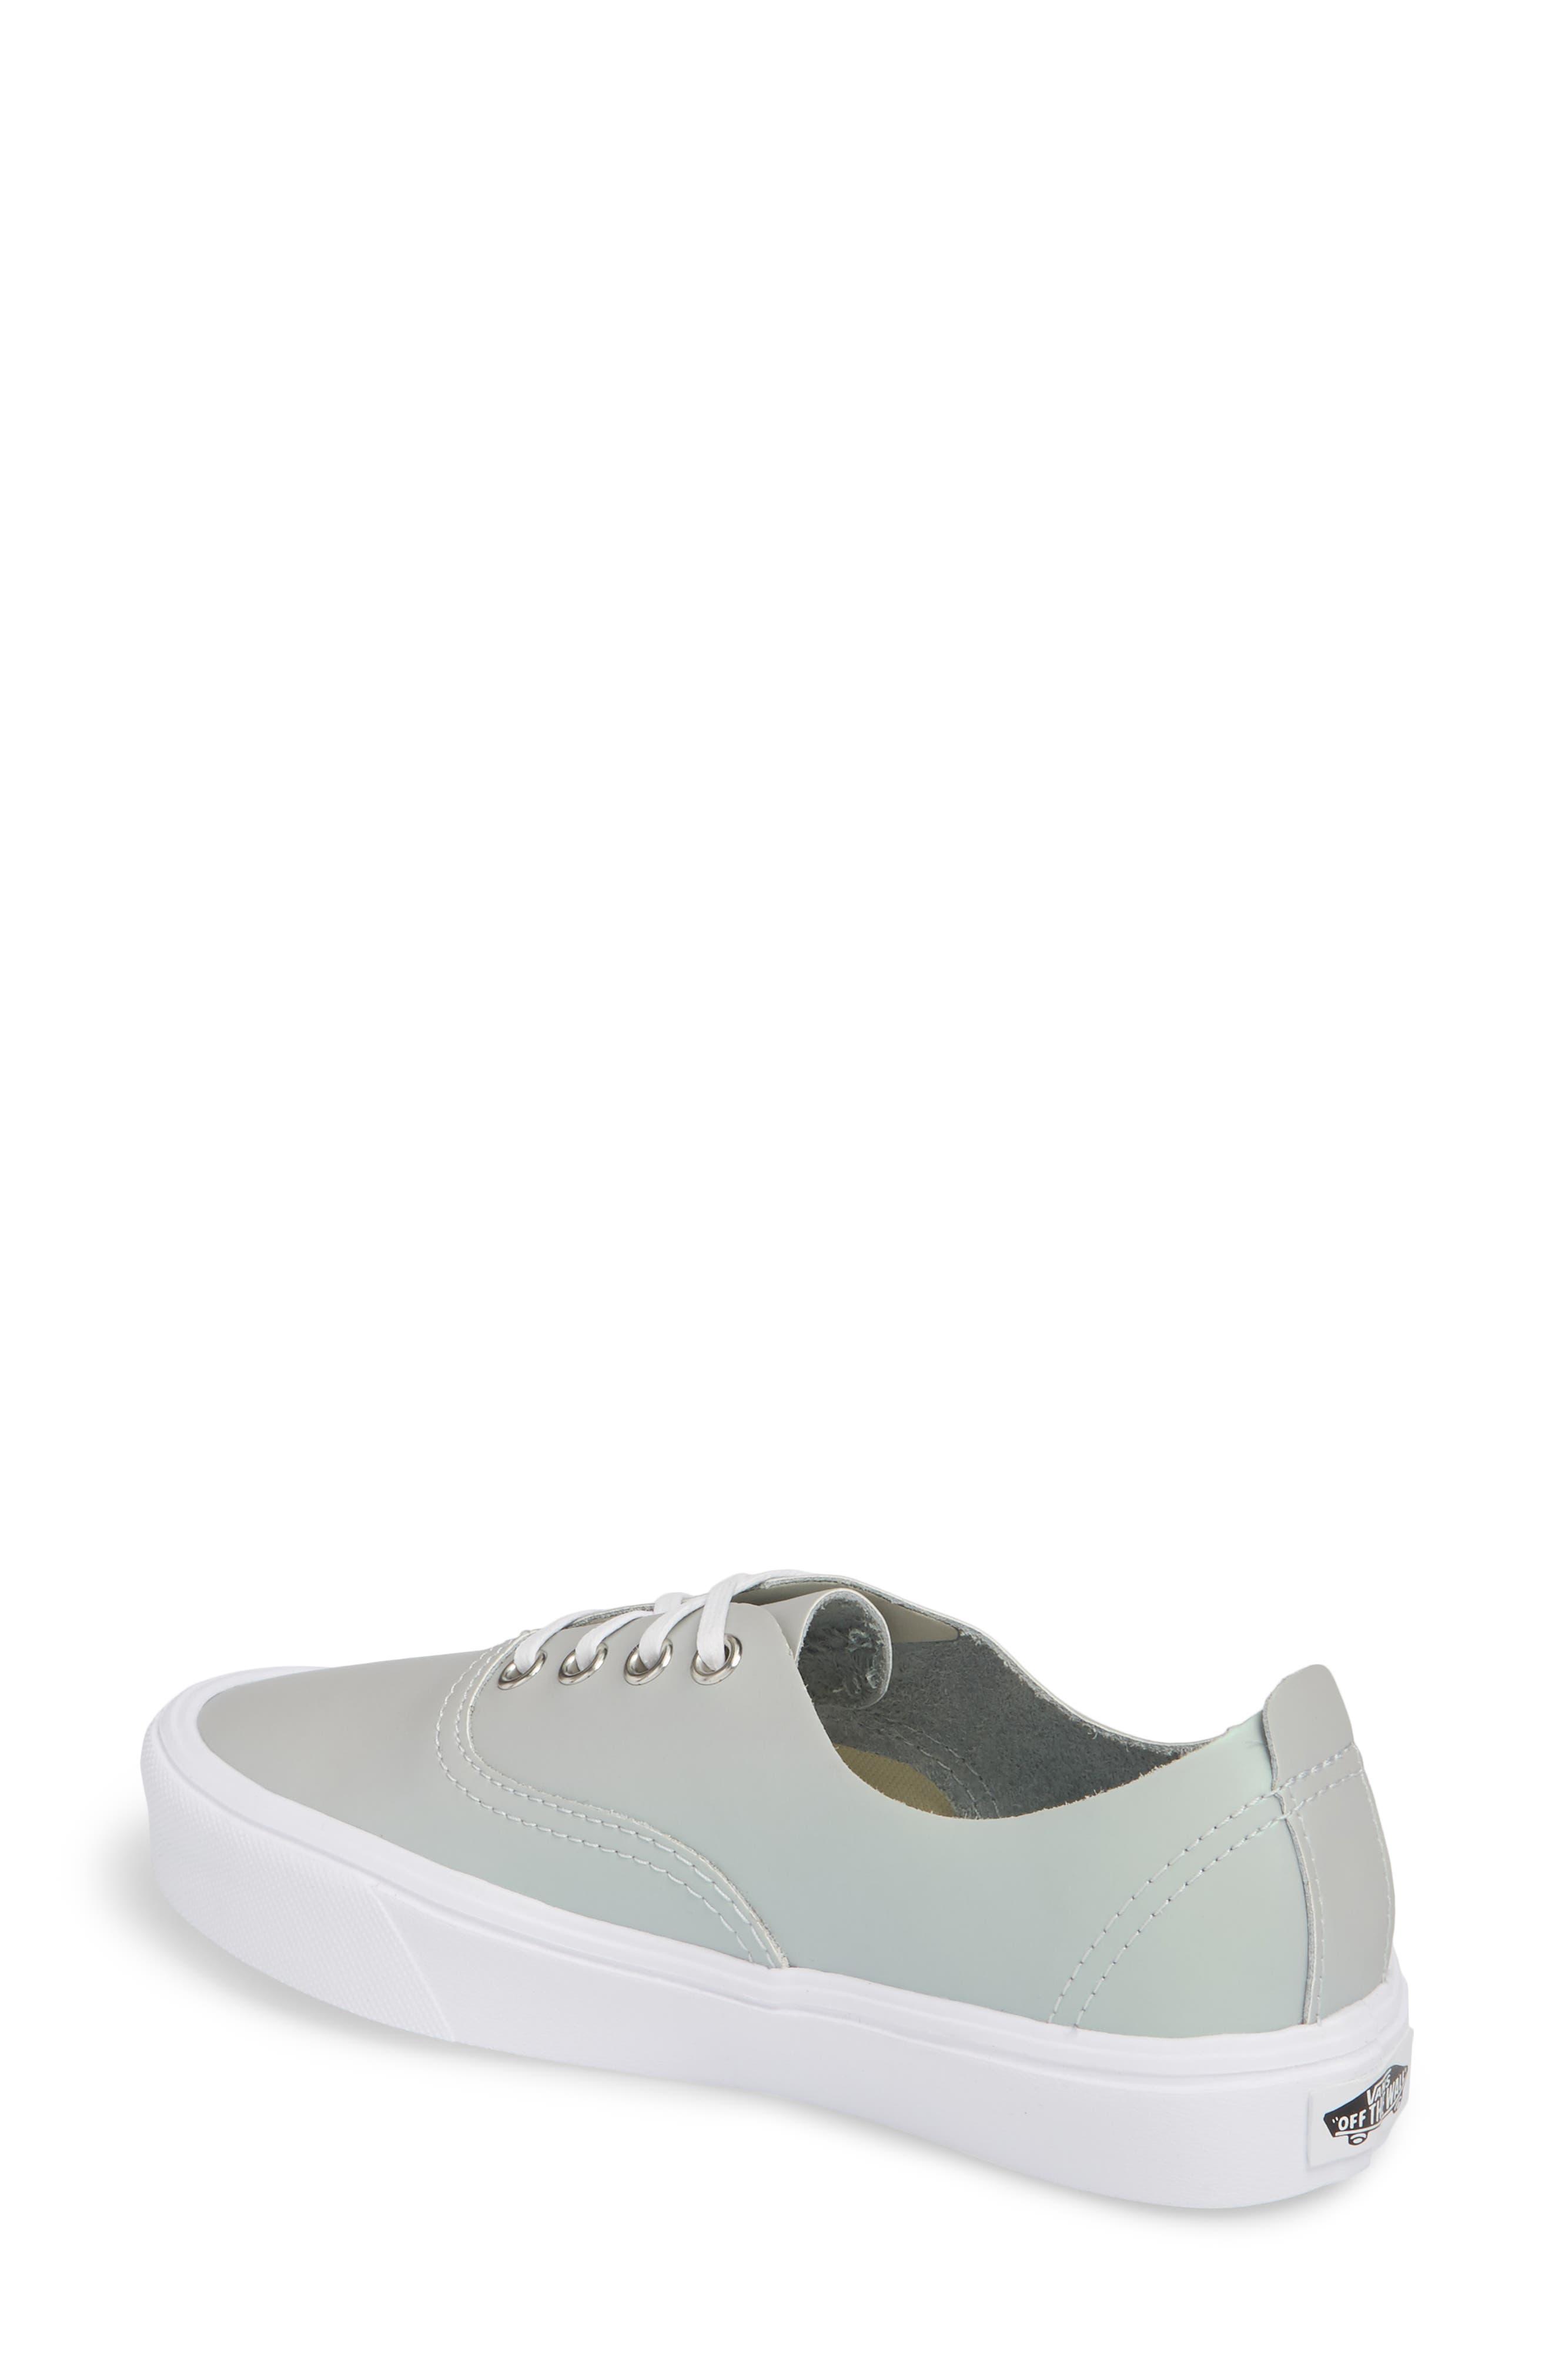 ,                             'Authentic' Sneaker,                             Alternate thumbnail 254, color,                             302